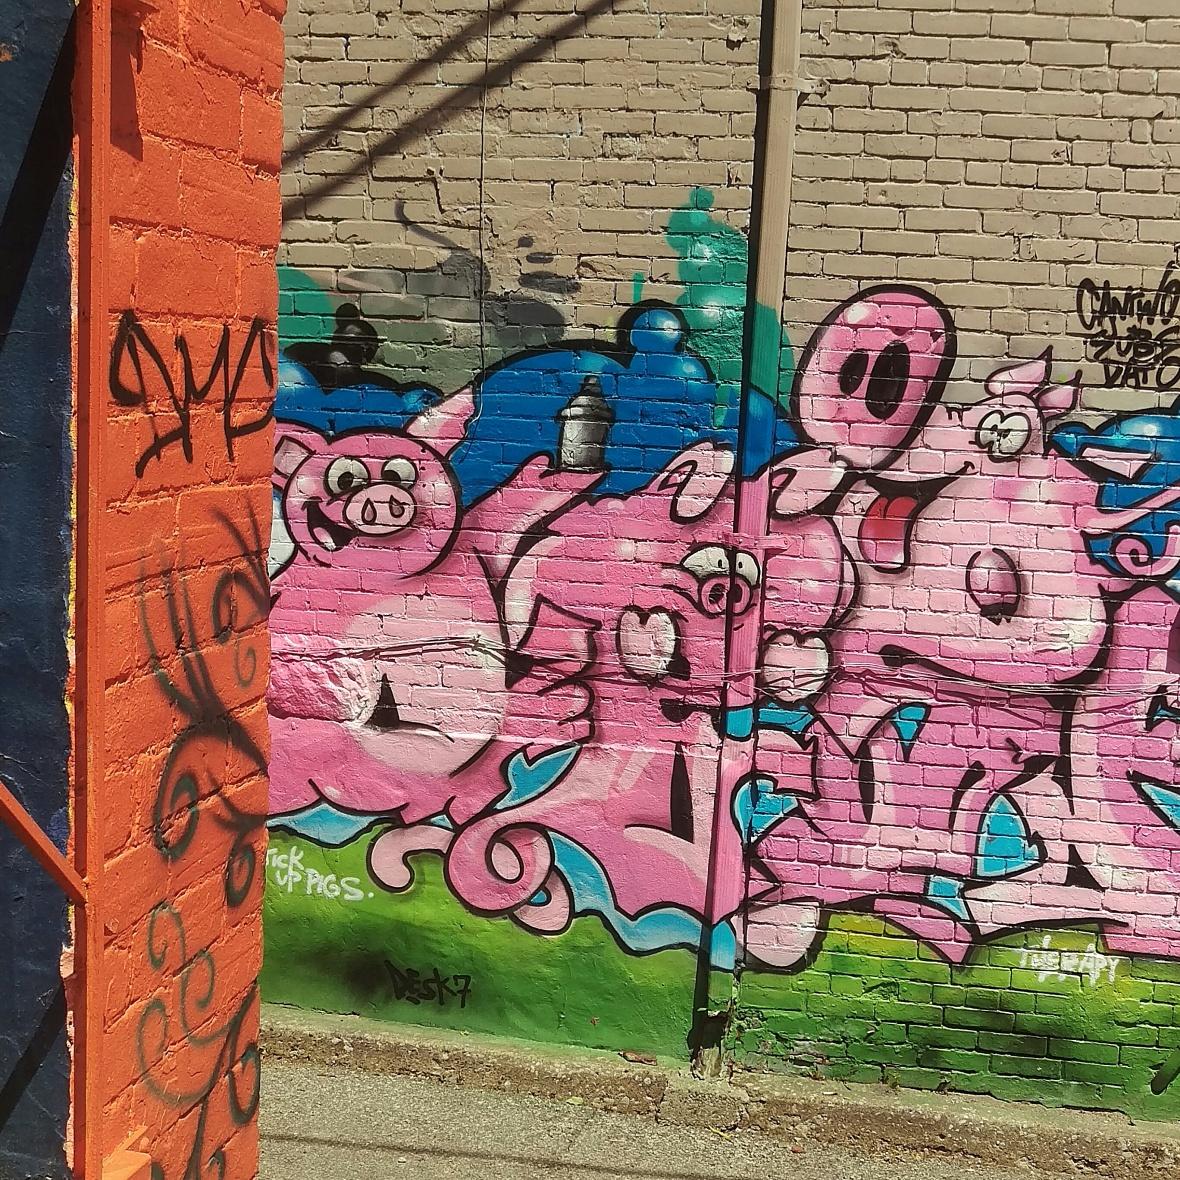 Pig Graffiti in kensington market